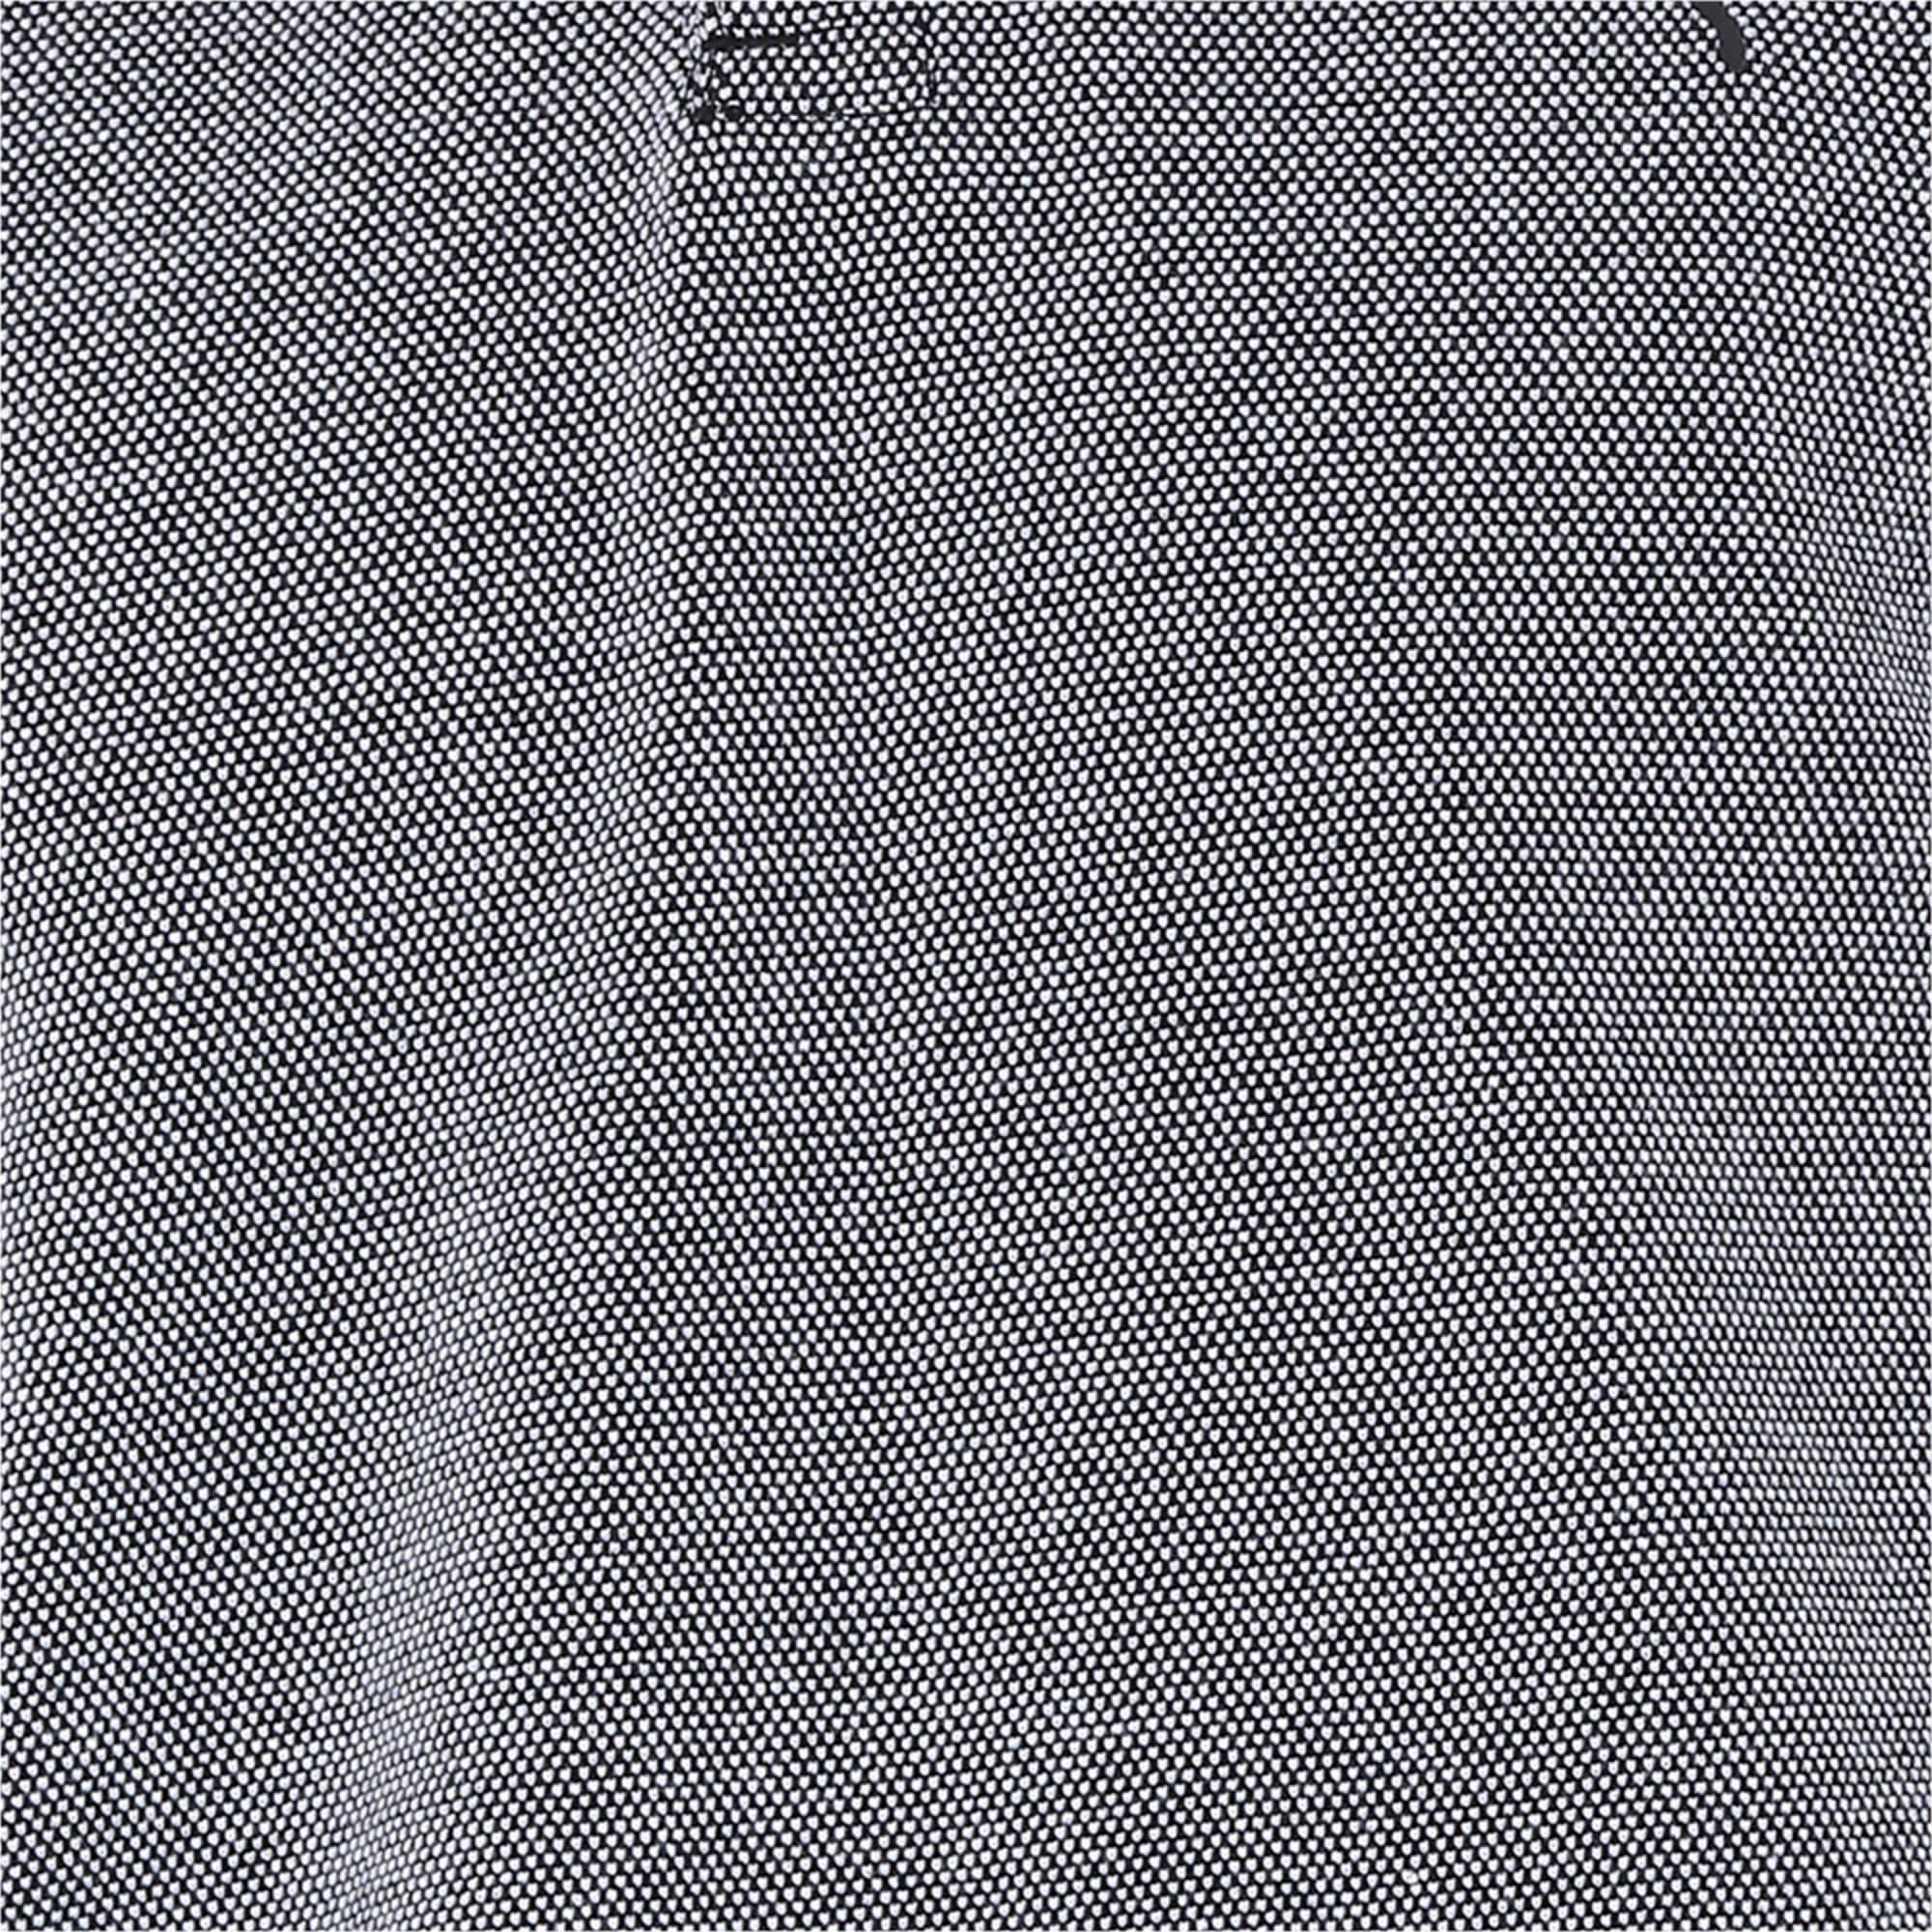 Thumbnail 6 of one8 Men's Jacquard Polo, Puma Black, medium-IND